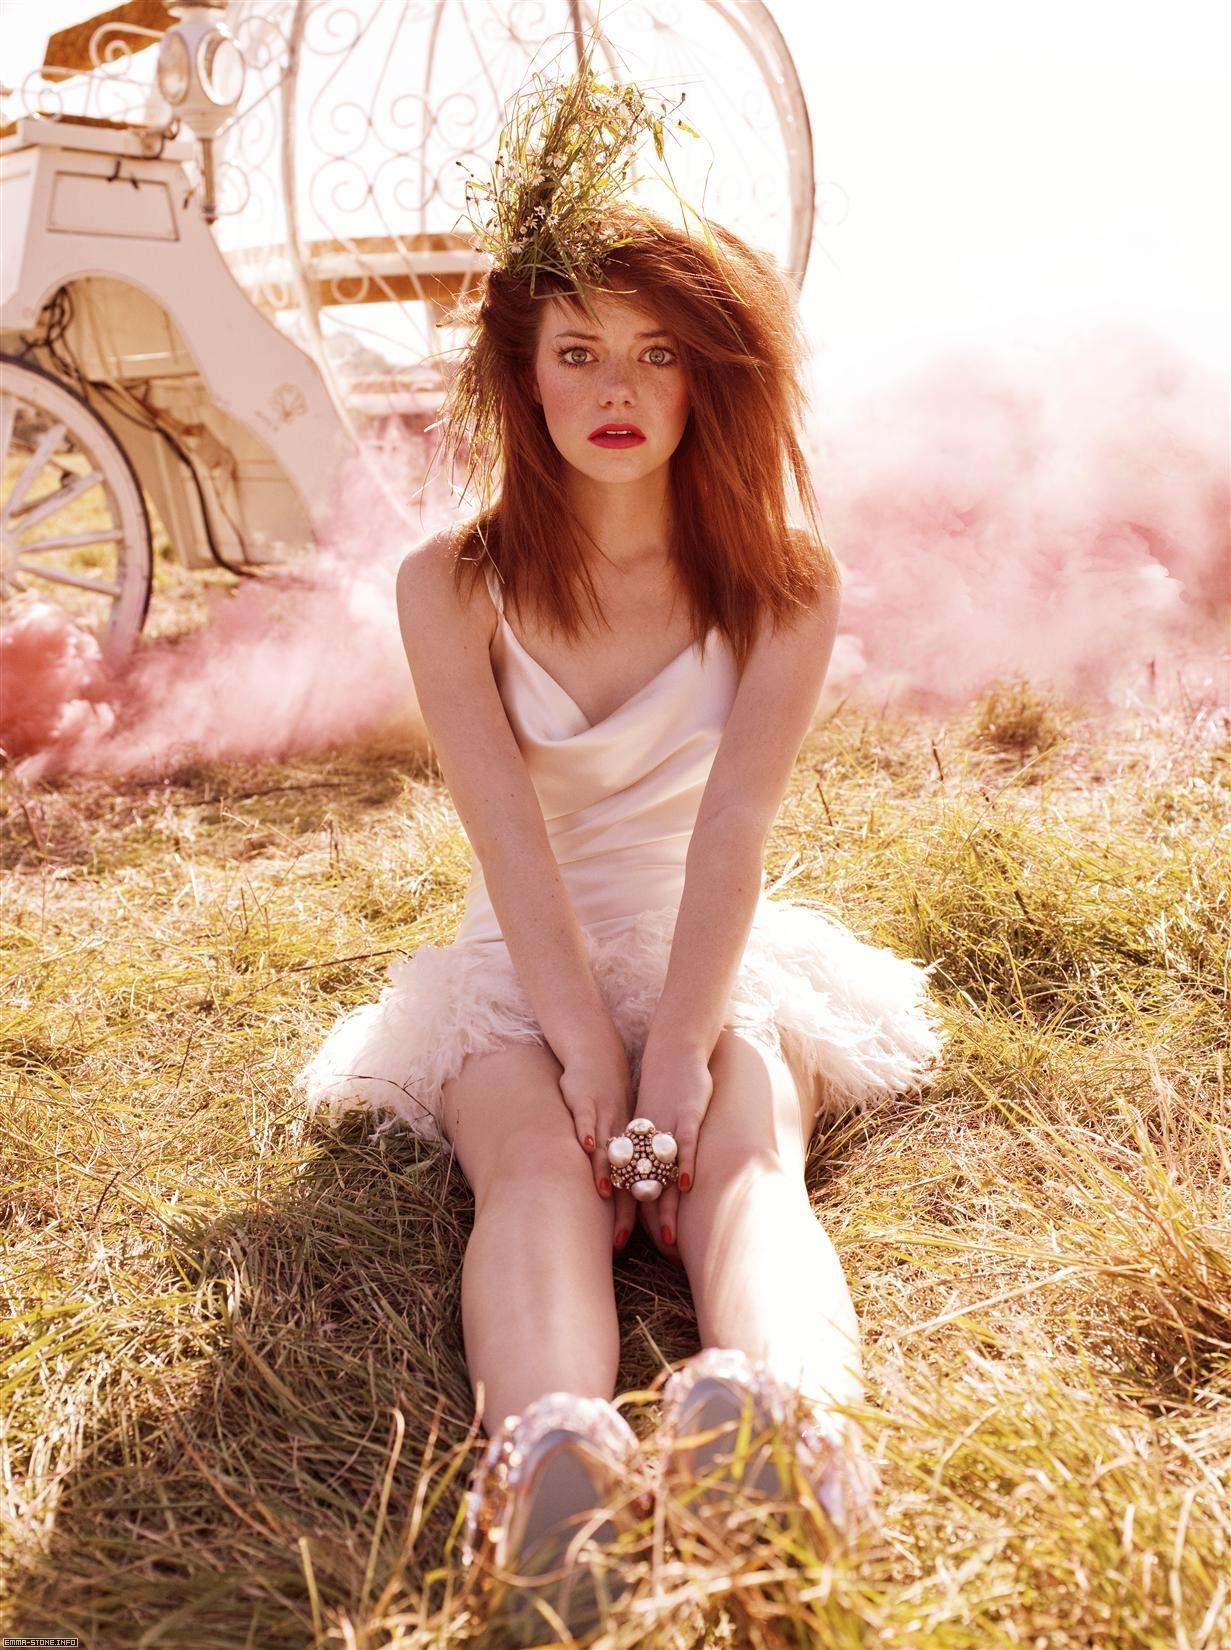 Emma Stone images Emma HD wallpaper and background photos ... Emma Stone